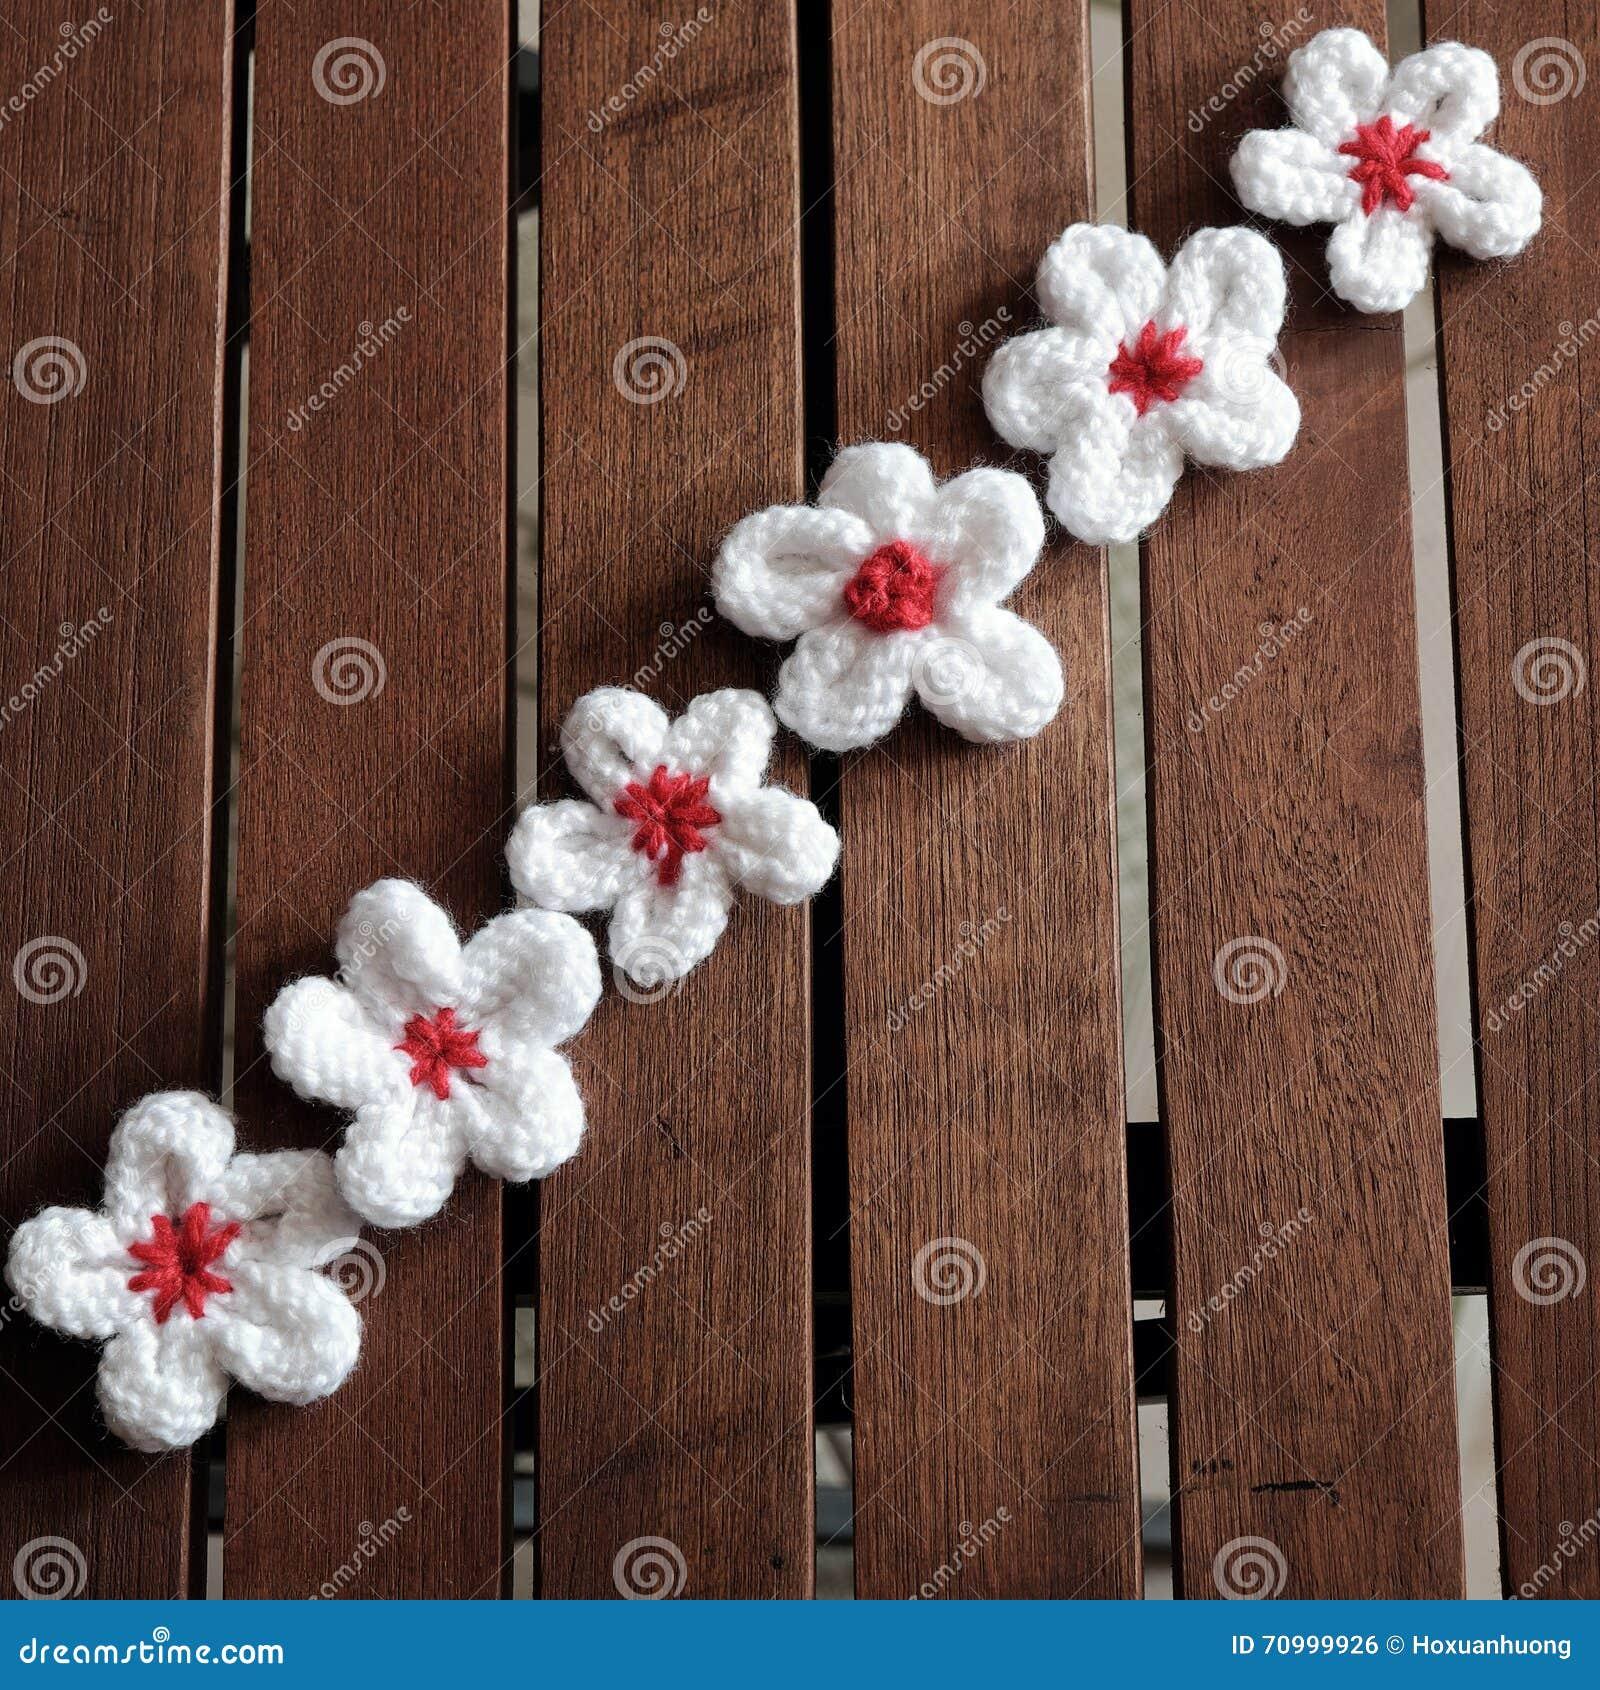 Knit Daisy Flower On Wood Background Stock Photo Image Of Flowers